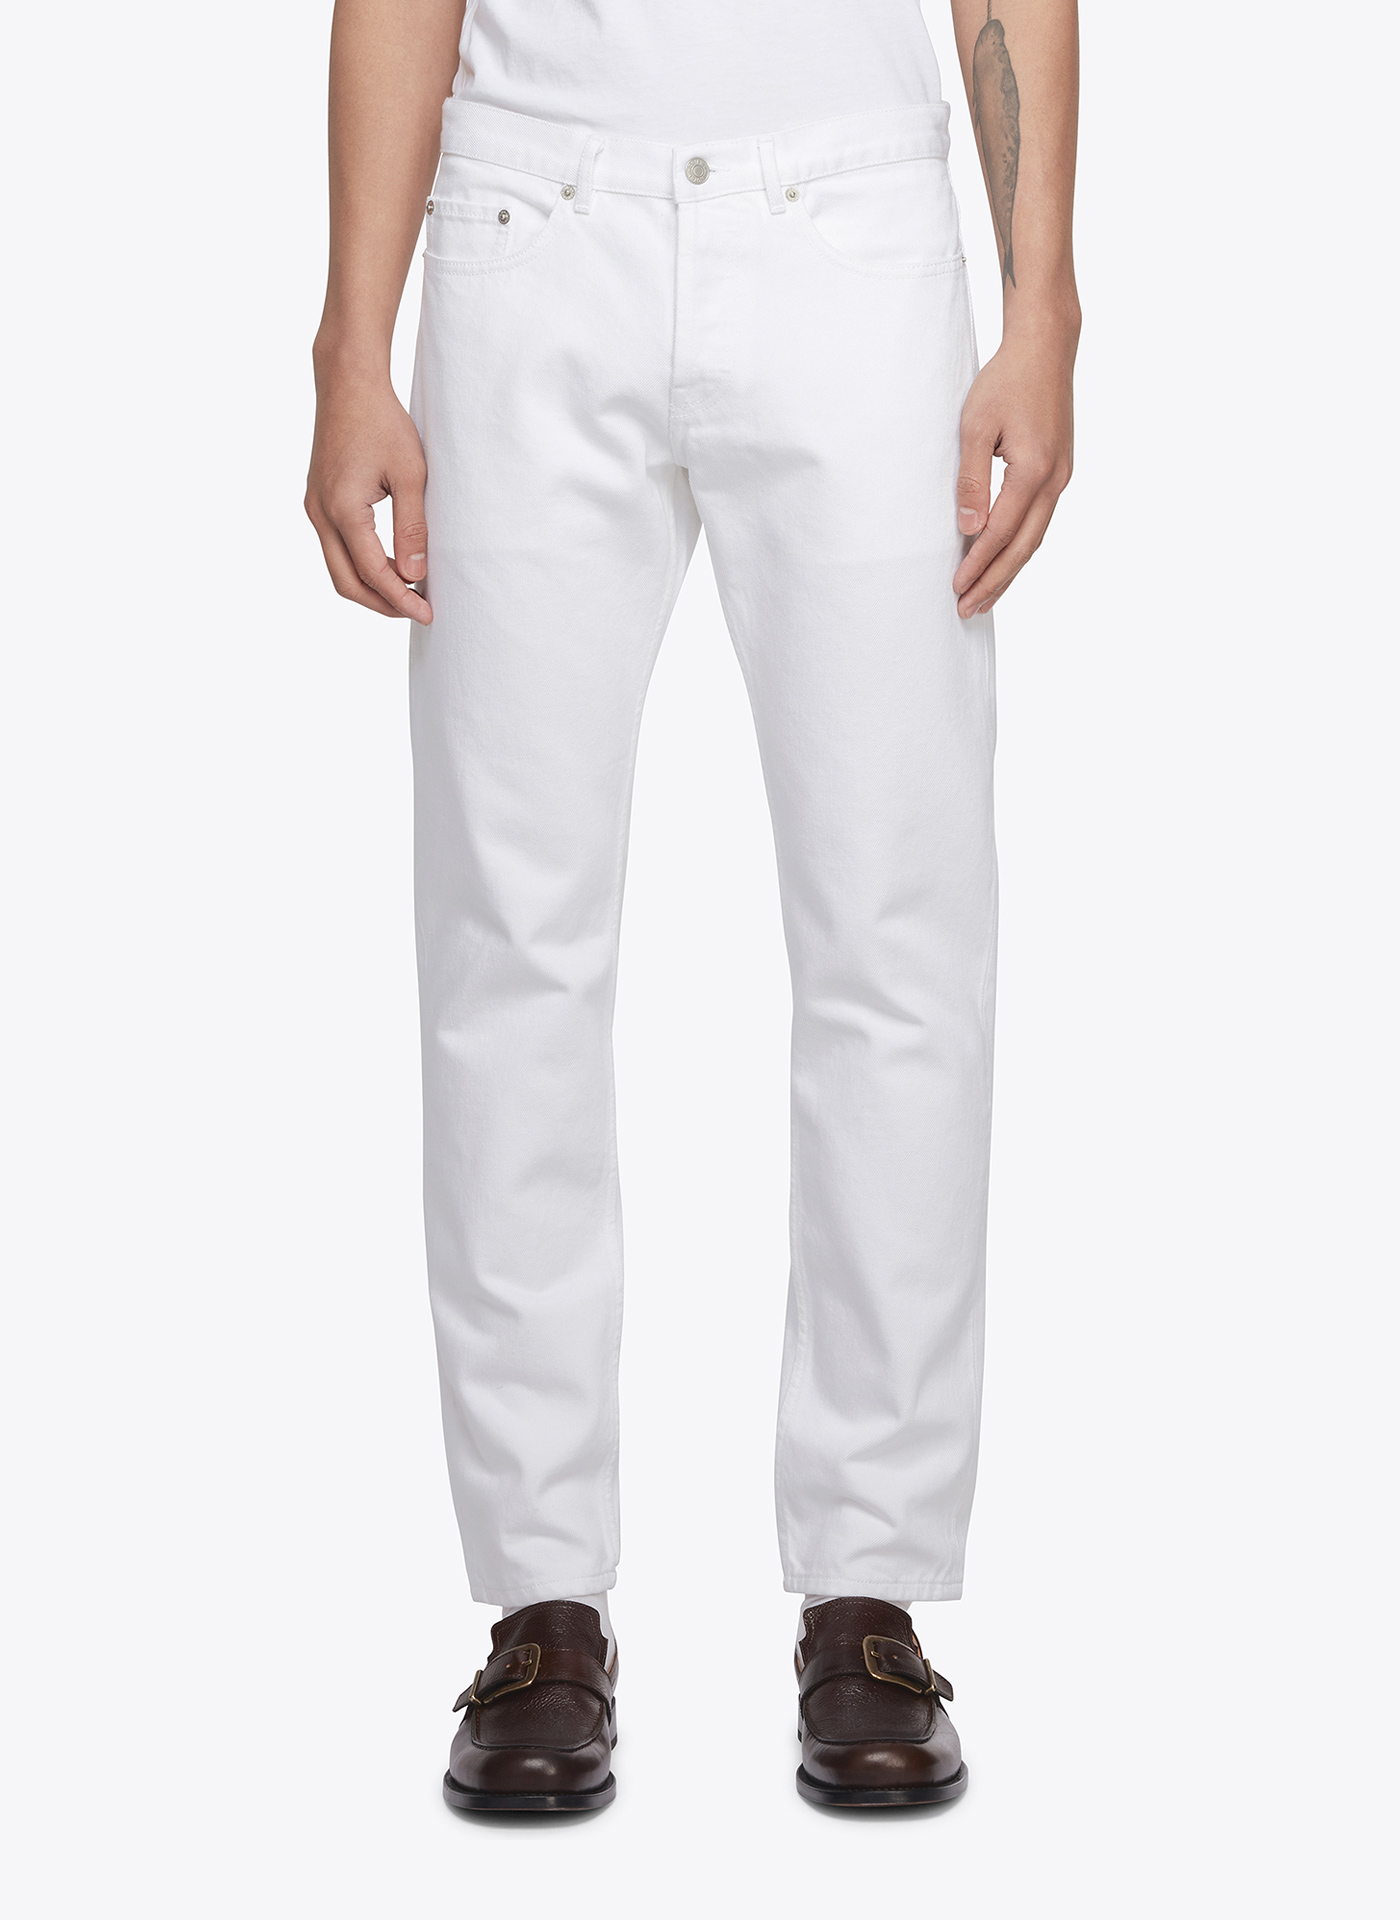 white denim trousers worn by a menswear model